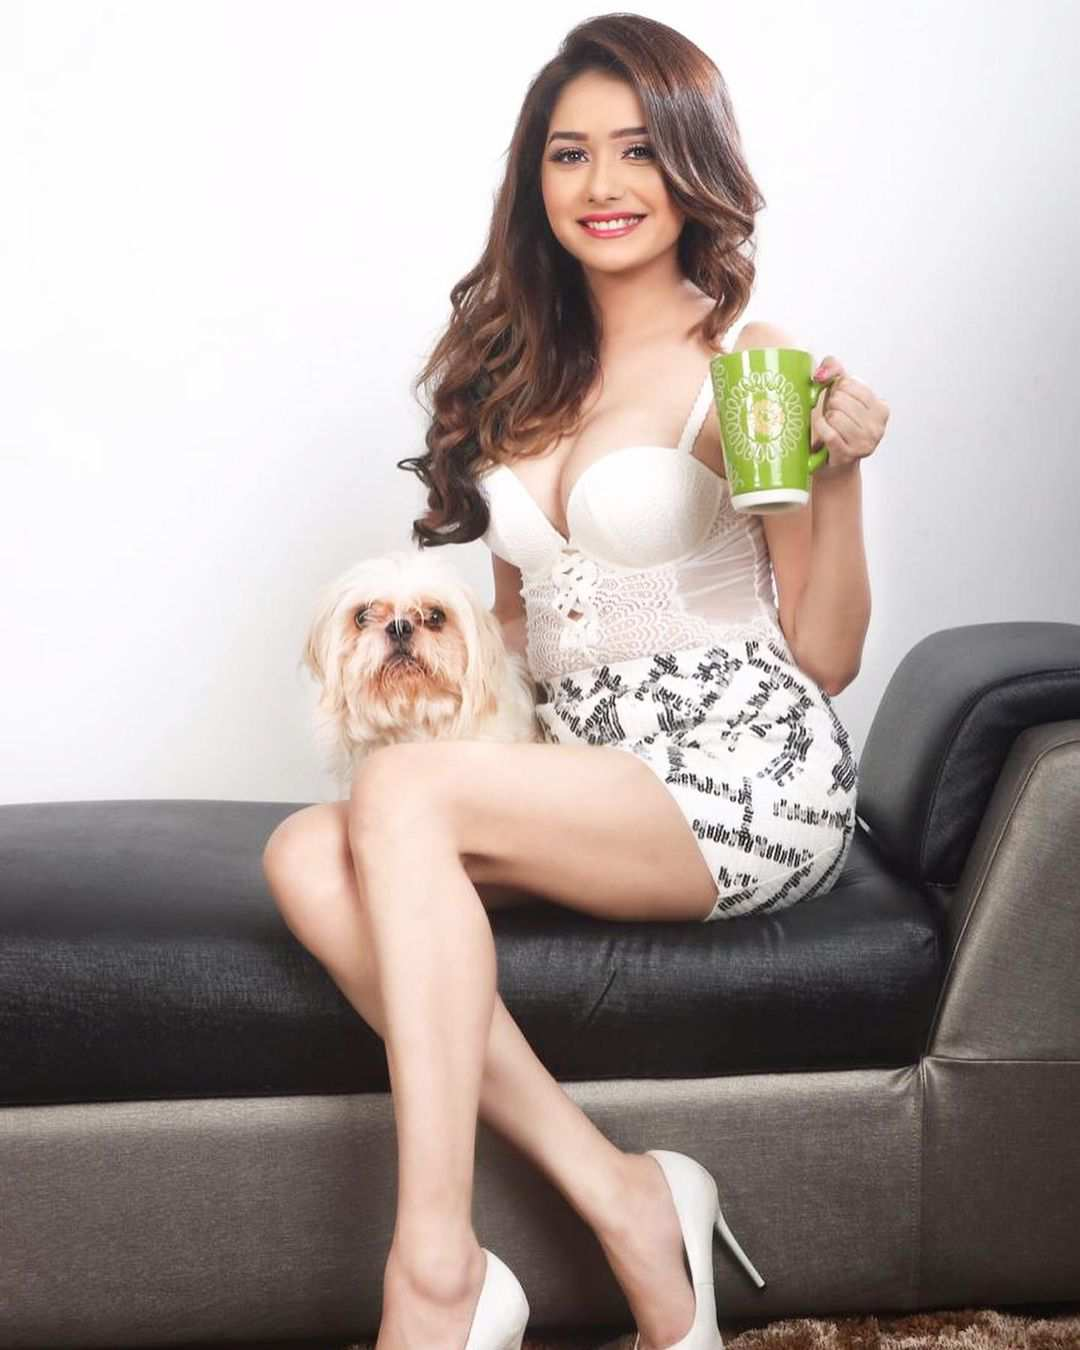 Indian Model Leena Jumani Pictures